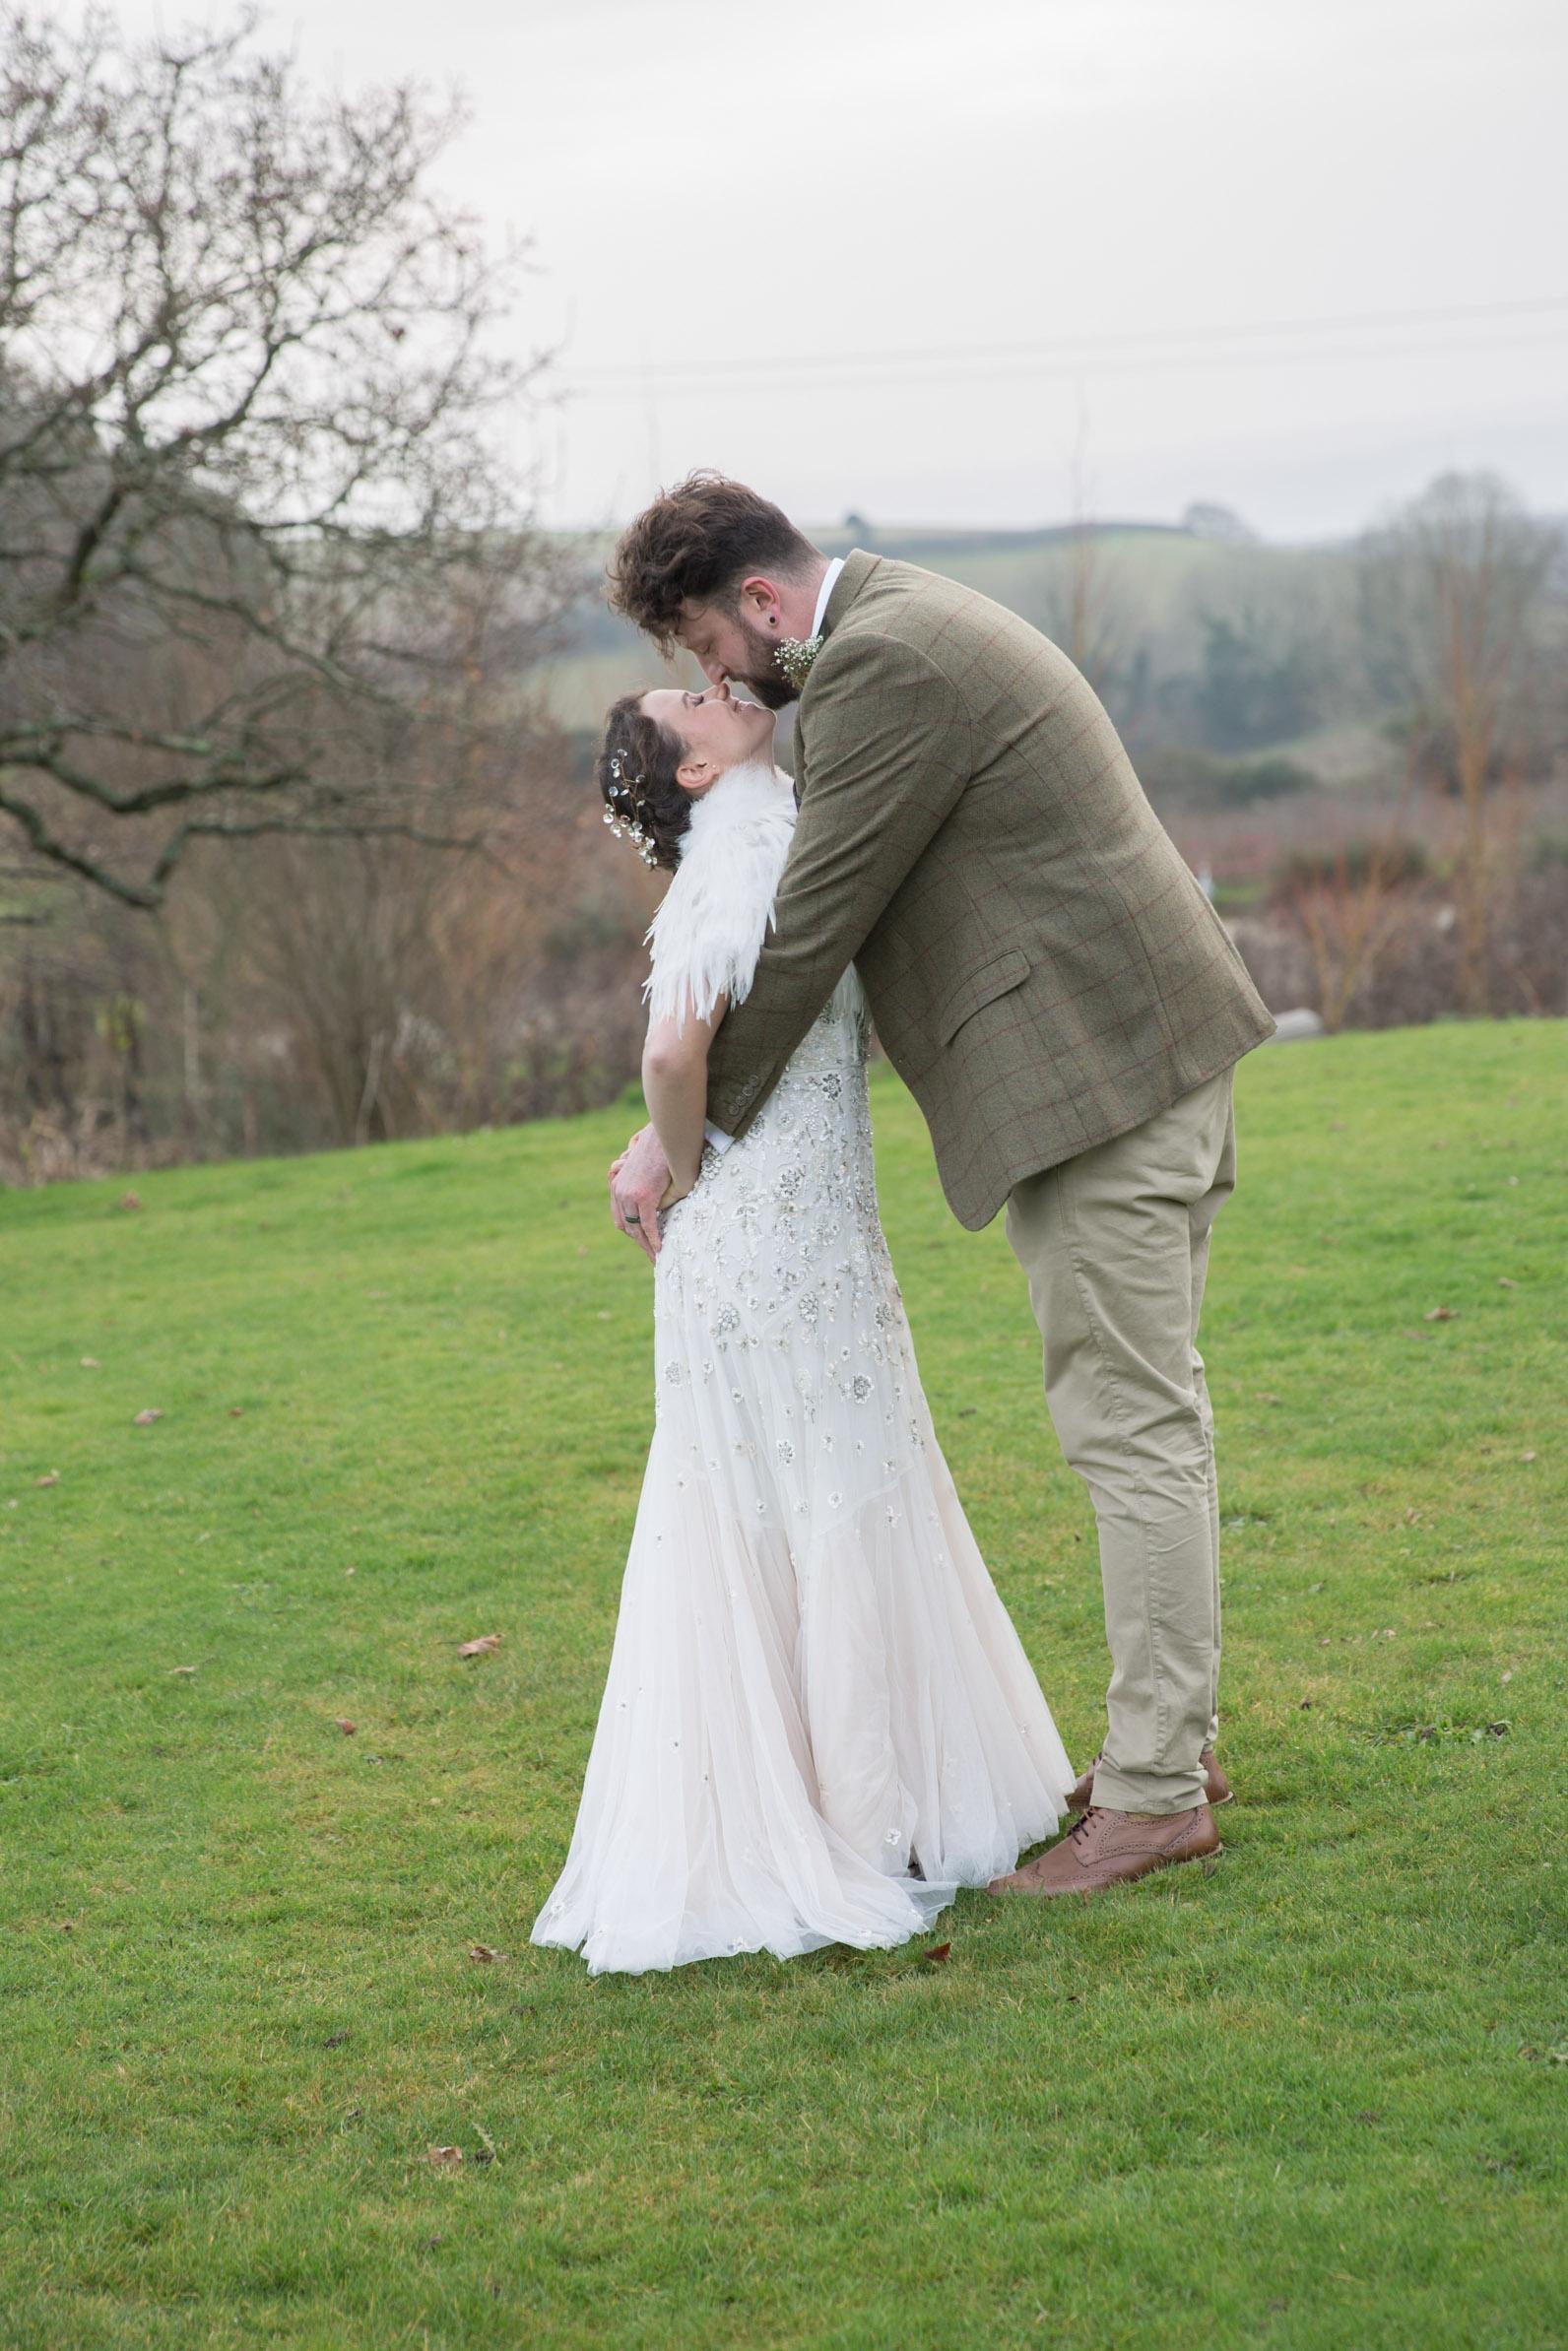 Jess & Ben - Bristol Wedding Photographer - Wright Wedding Photography - 114